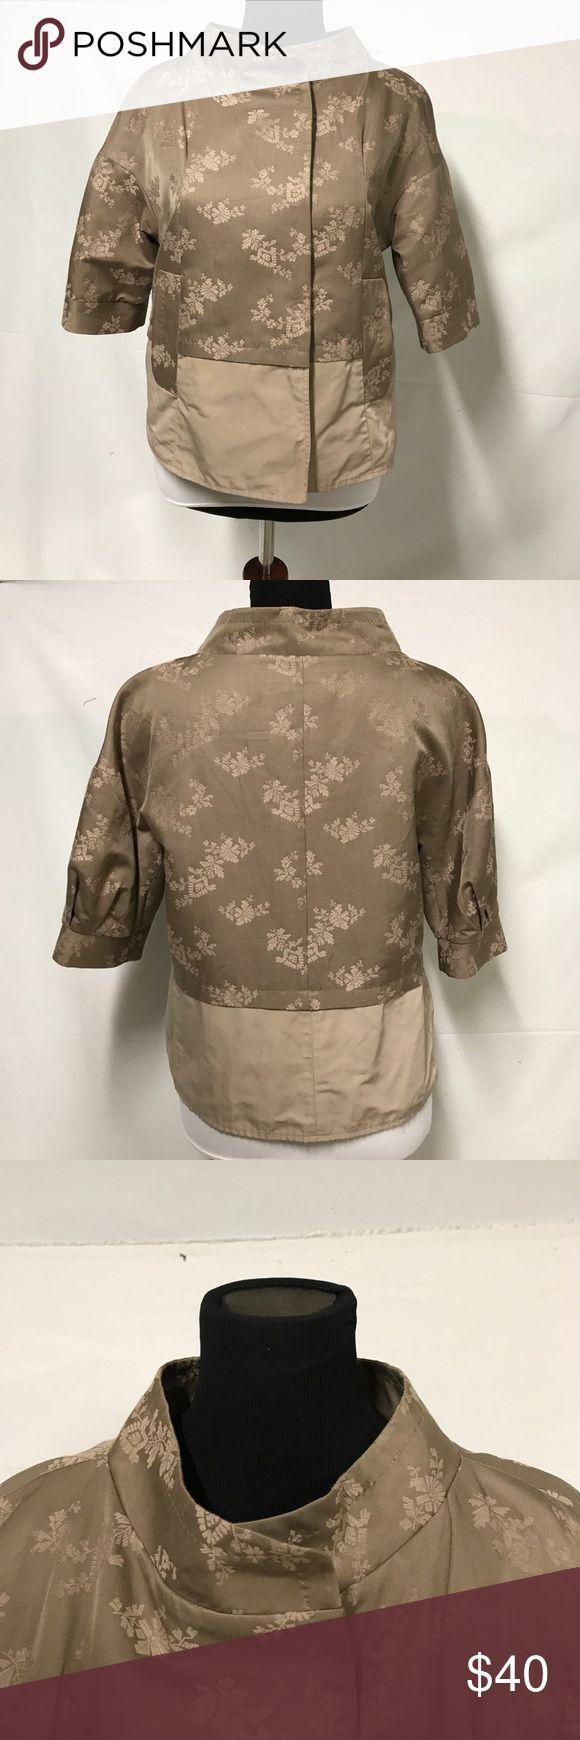 BCBG MAXAZRIA taupe cotton/silk blend jacket Short sleeve, snap closure, funnel neck. Cool look. BCBGMaxAzria Jackets & Coats